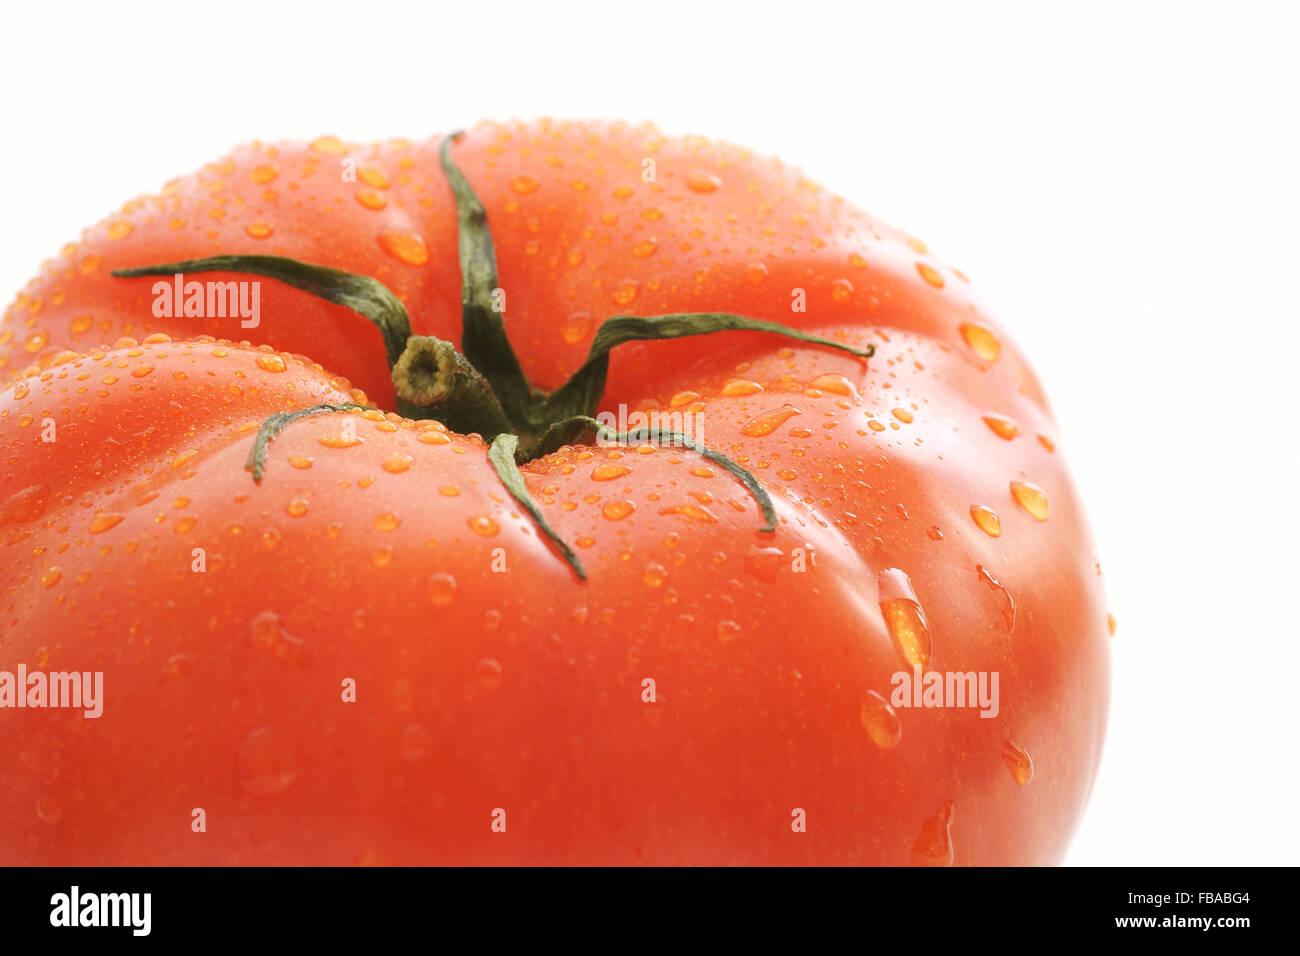 Fresh and plump beefsteak tomato - Stock Image